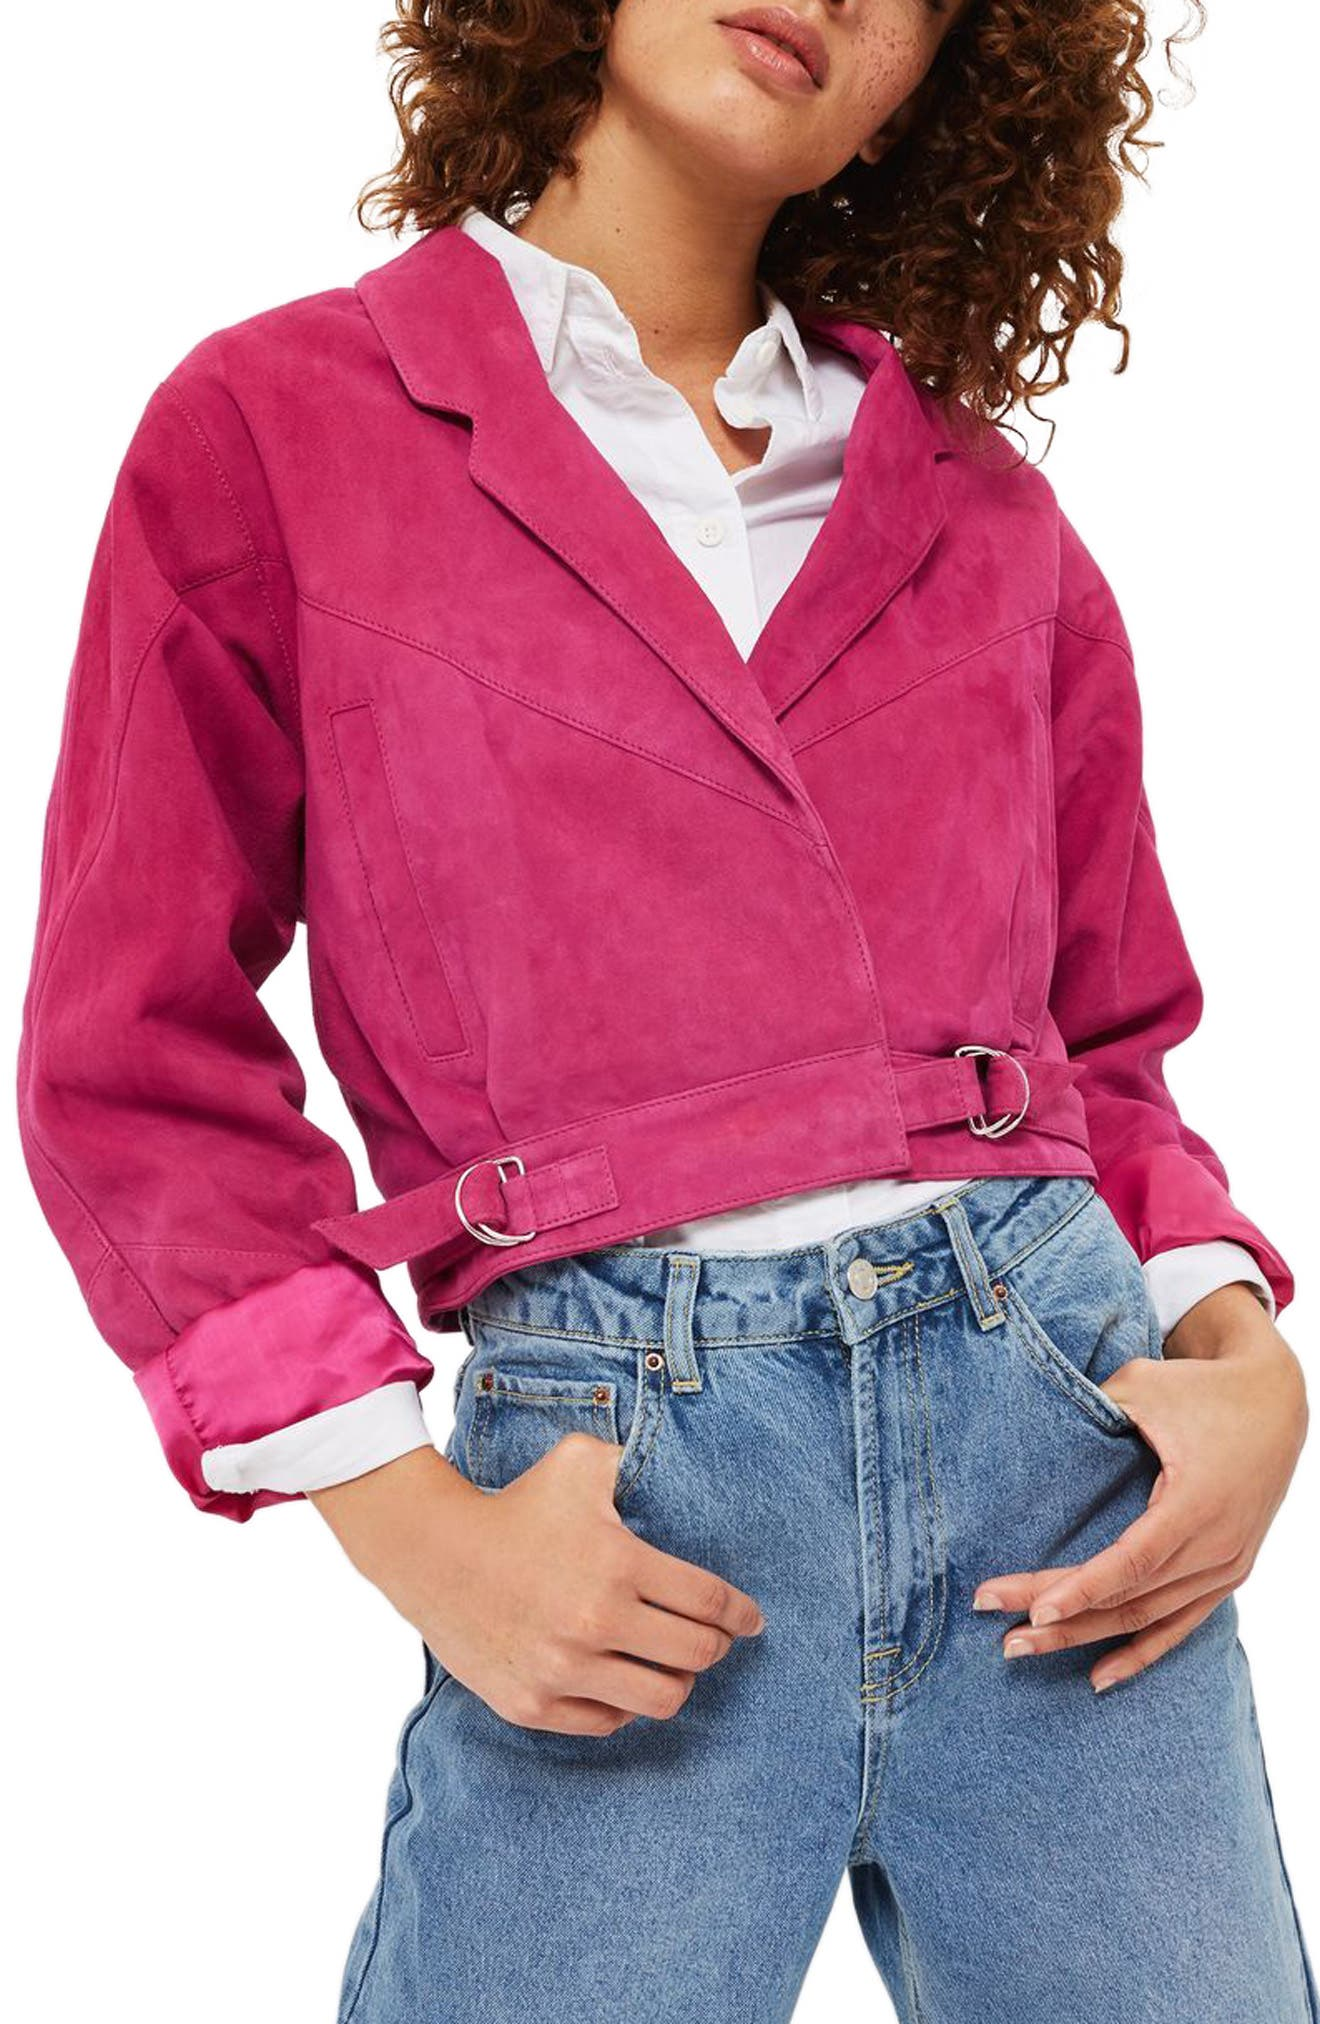 Topshop Maggie Crop Suede Jacket